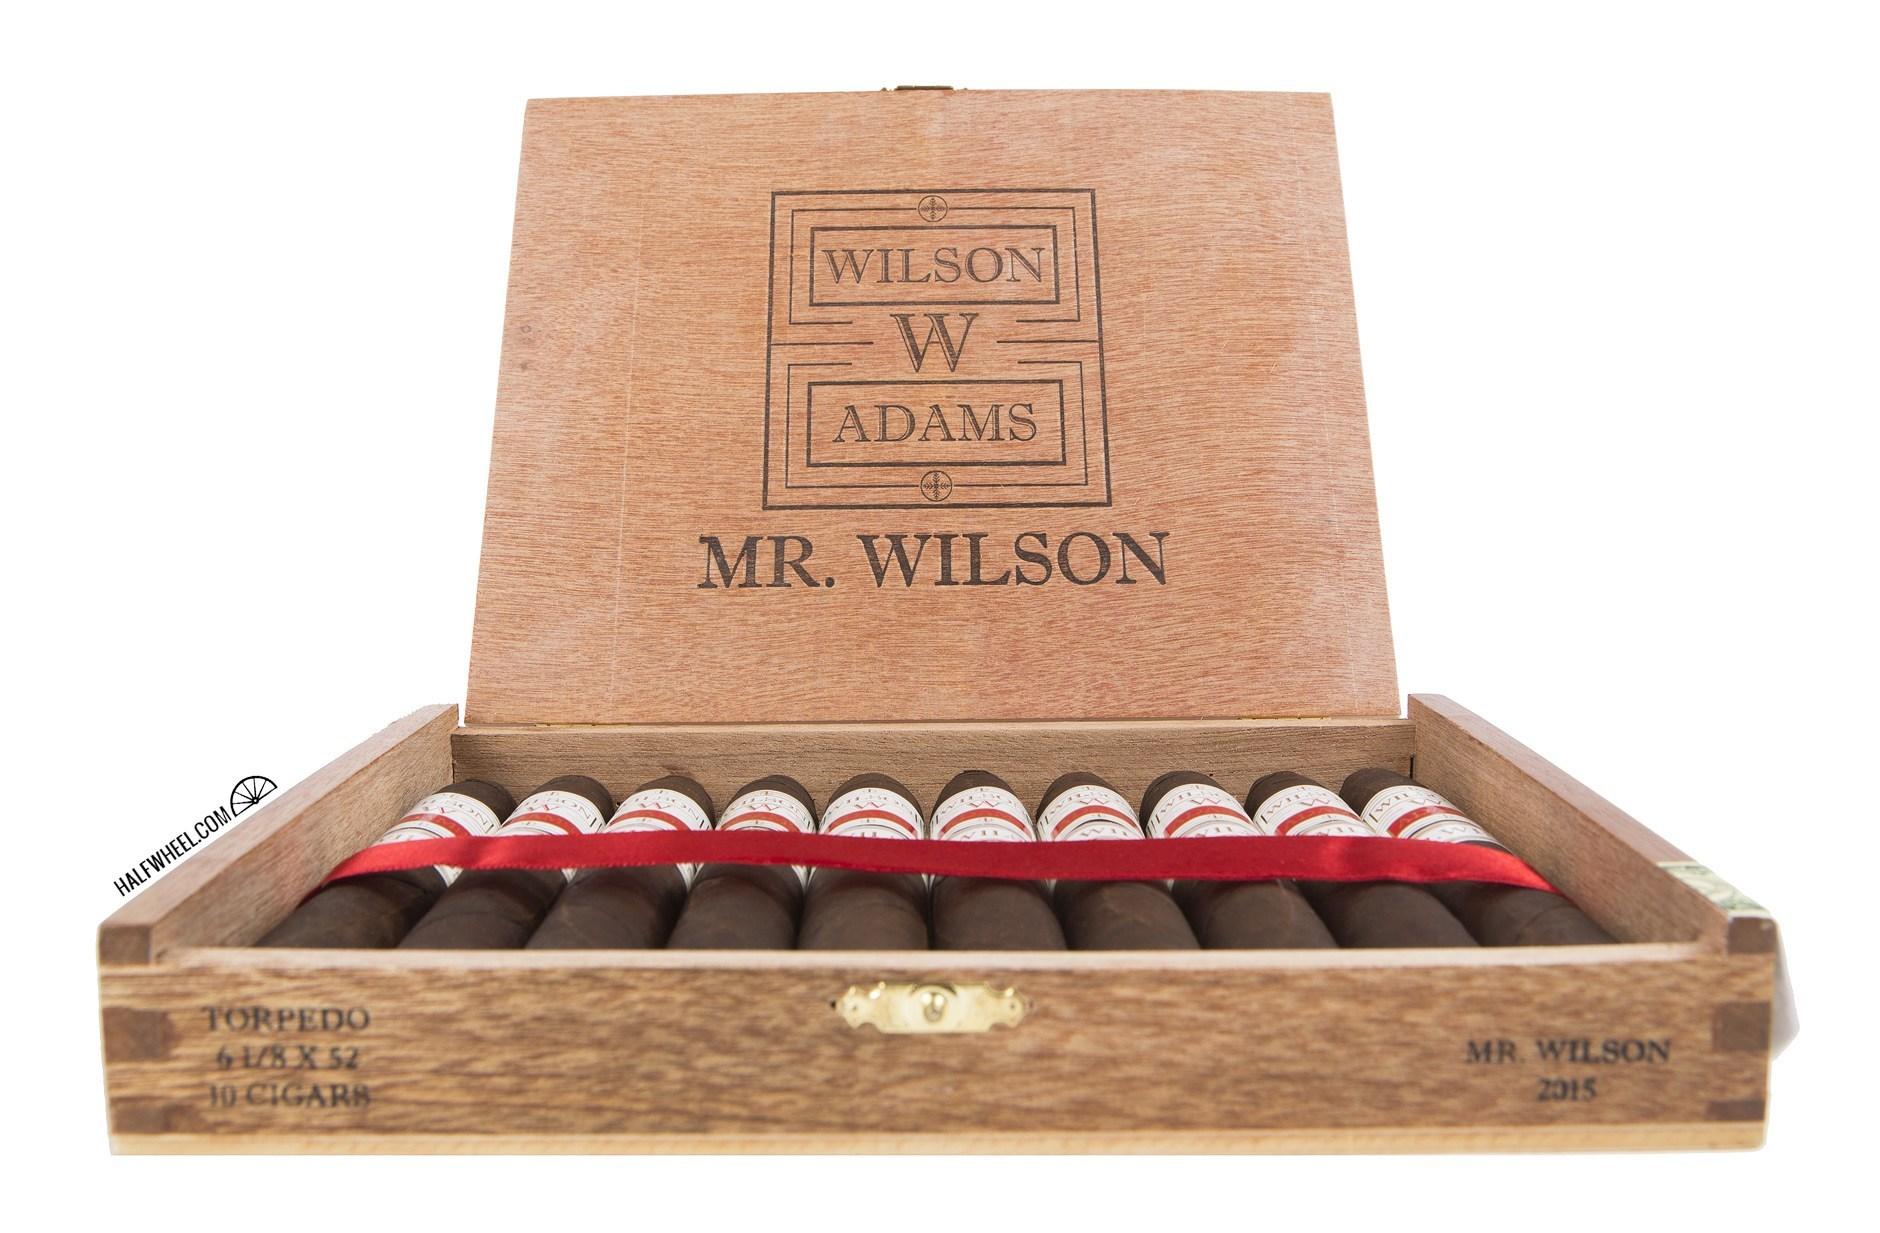 Wilson Adams Mr. Wilson Box 2